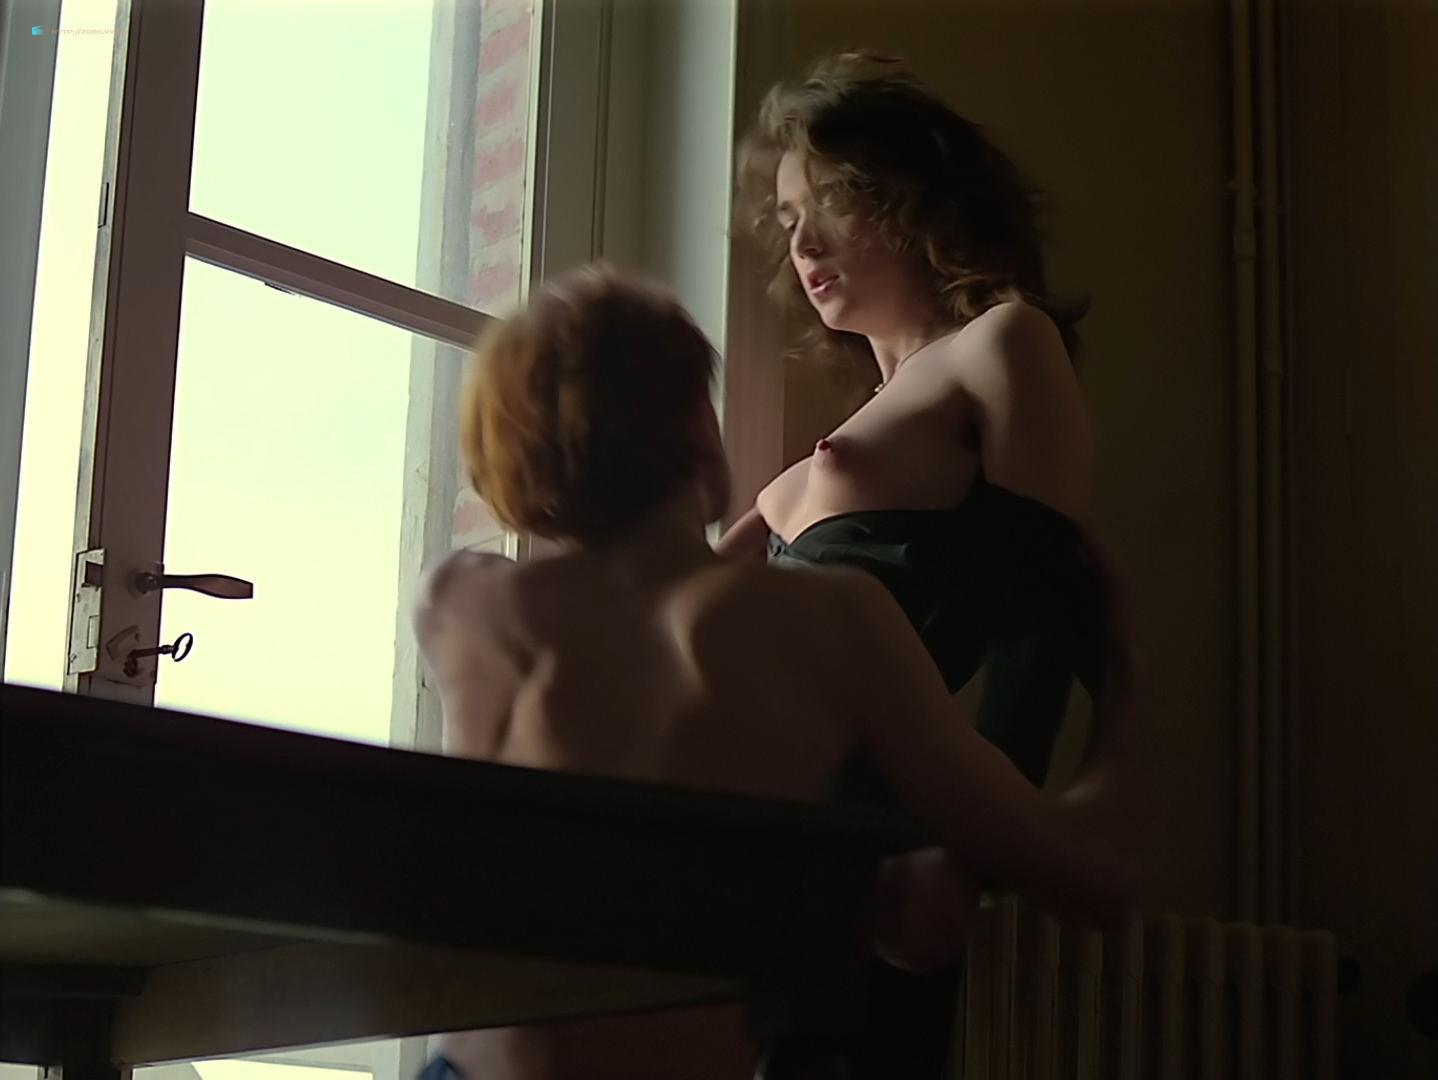 Maruschka Detmers nude full frontal - Prénom Carmen (1983) HD 1080p BluRay (18)